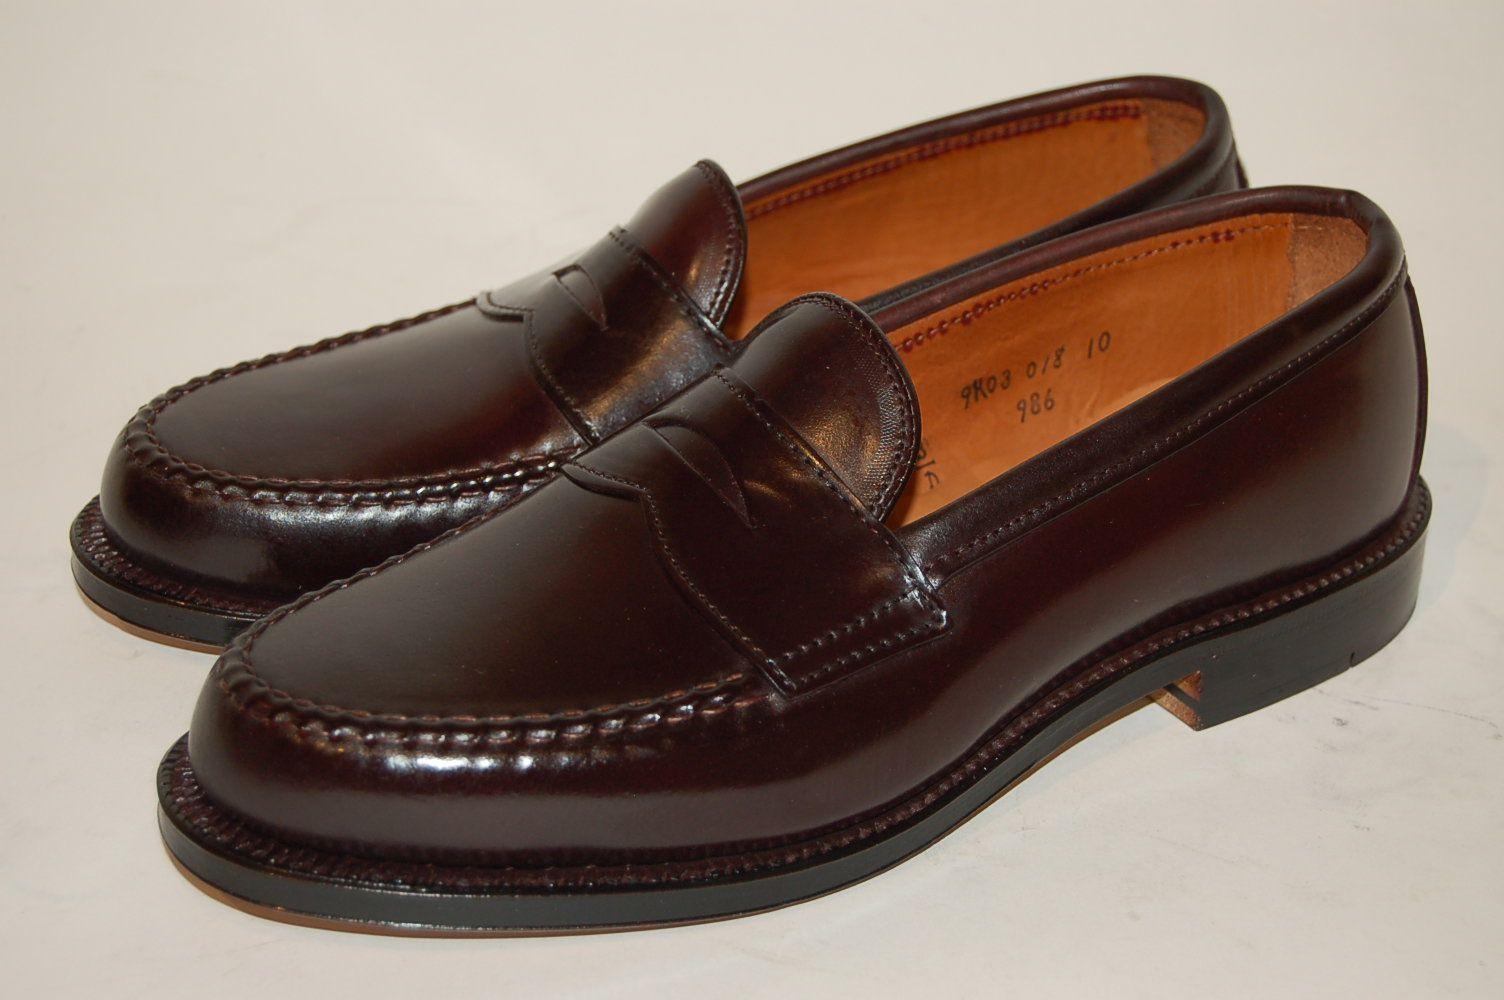 be956c8e37 Alden Shoe Company.. Van Last in Genuine Horween Shell Cordovan Color 8.